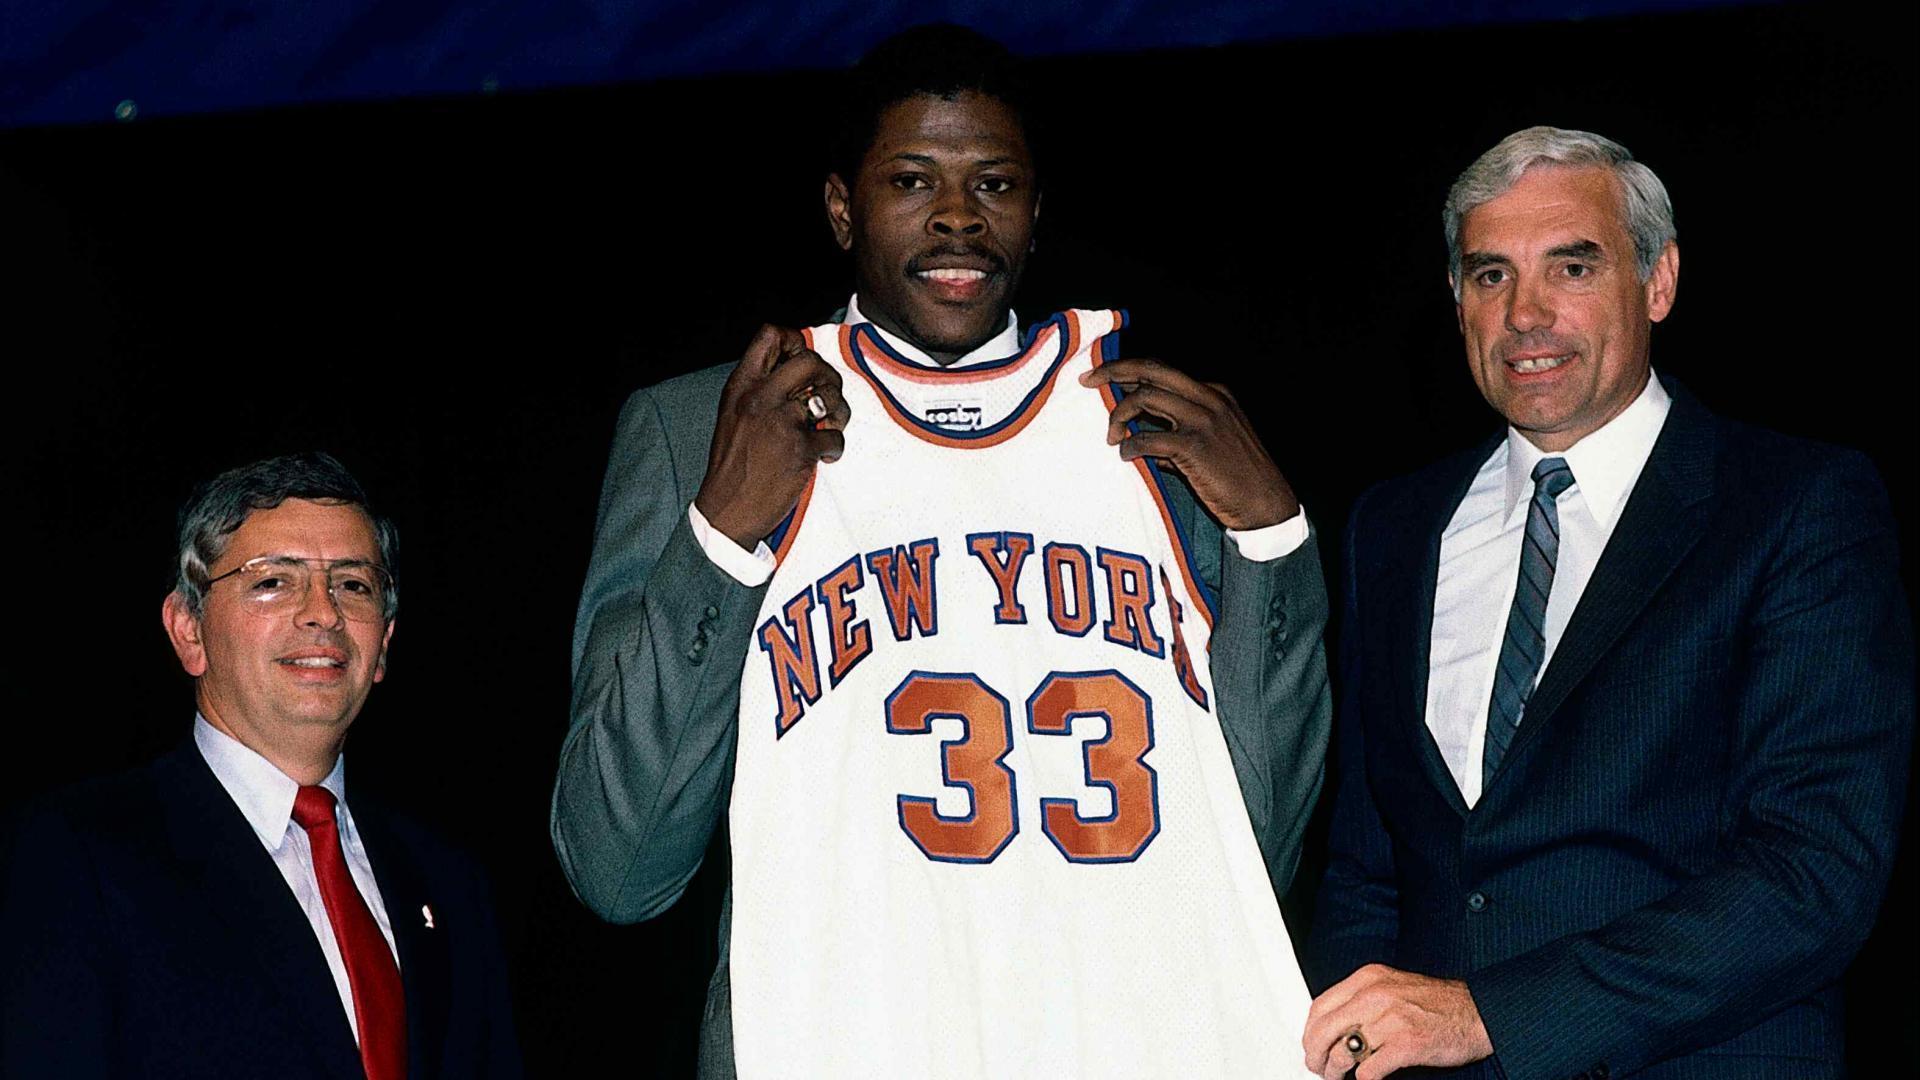 Patrick Ewing Knicks 1600×900 Wallpaper | Basketball ... |Patrick Ewing Wallpaper